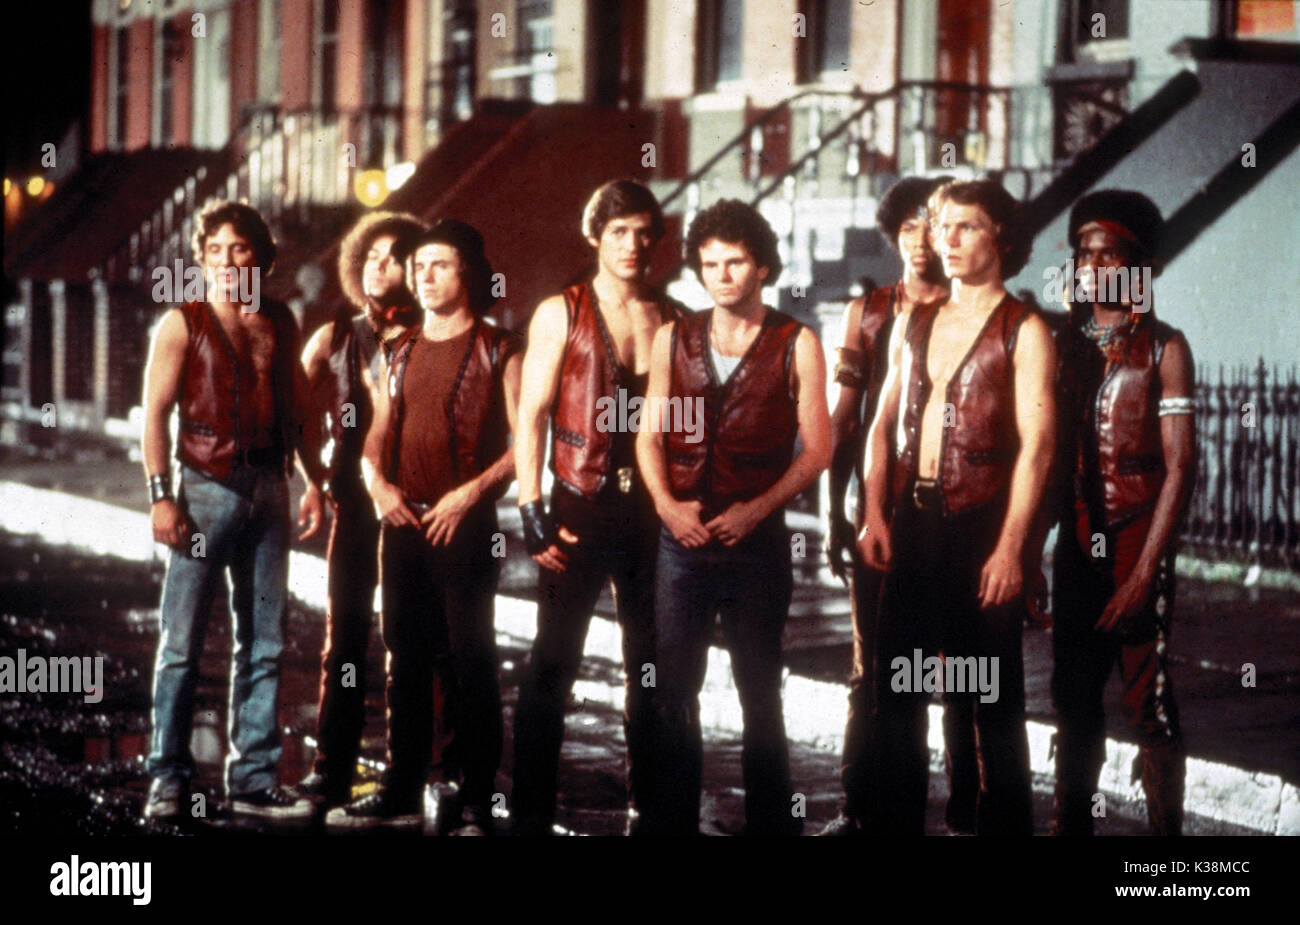 THE WARRIORS [?], [?], [?], JAMES REMAR, [?], BRIAN TYLER, MICHAEL BECK, DAVID HARRIS - Stock Image